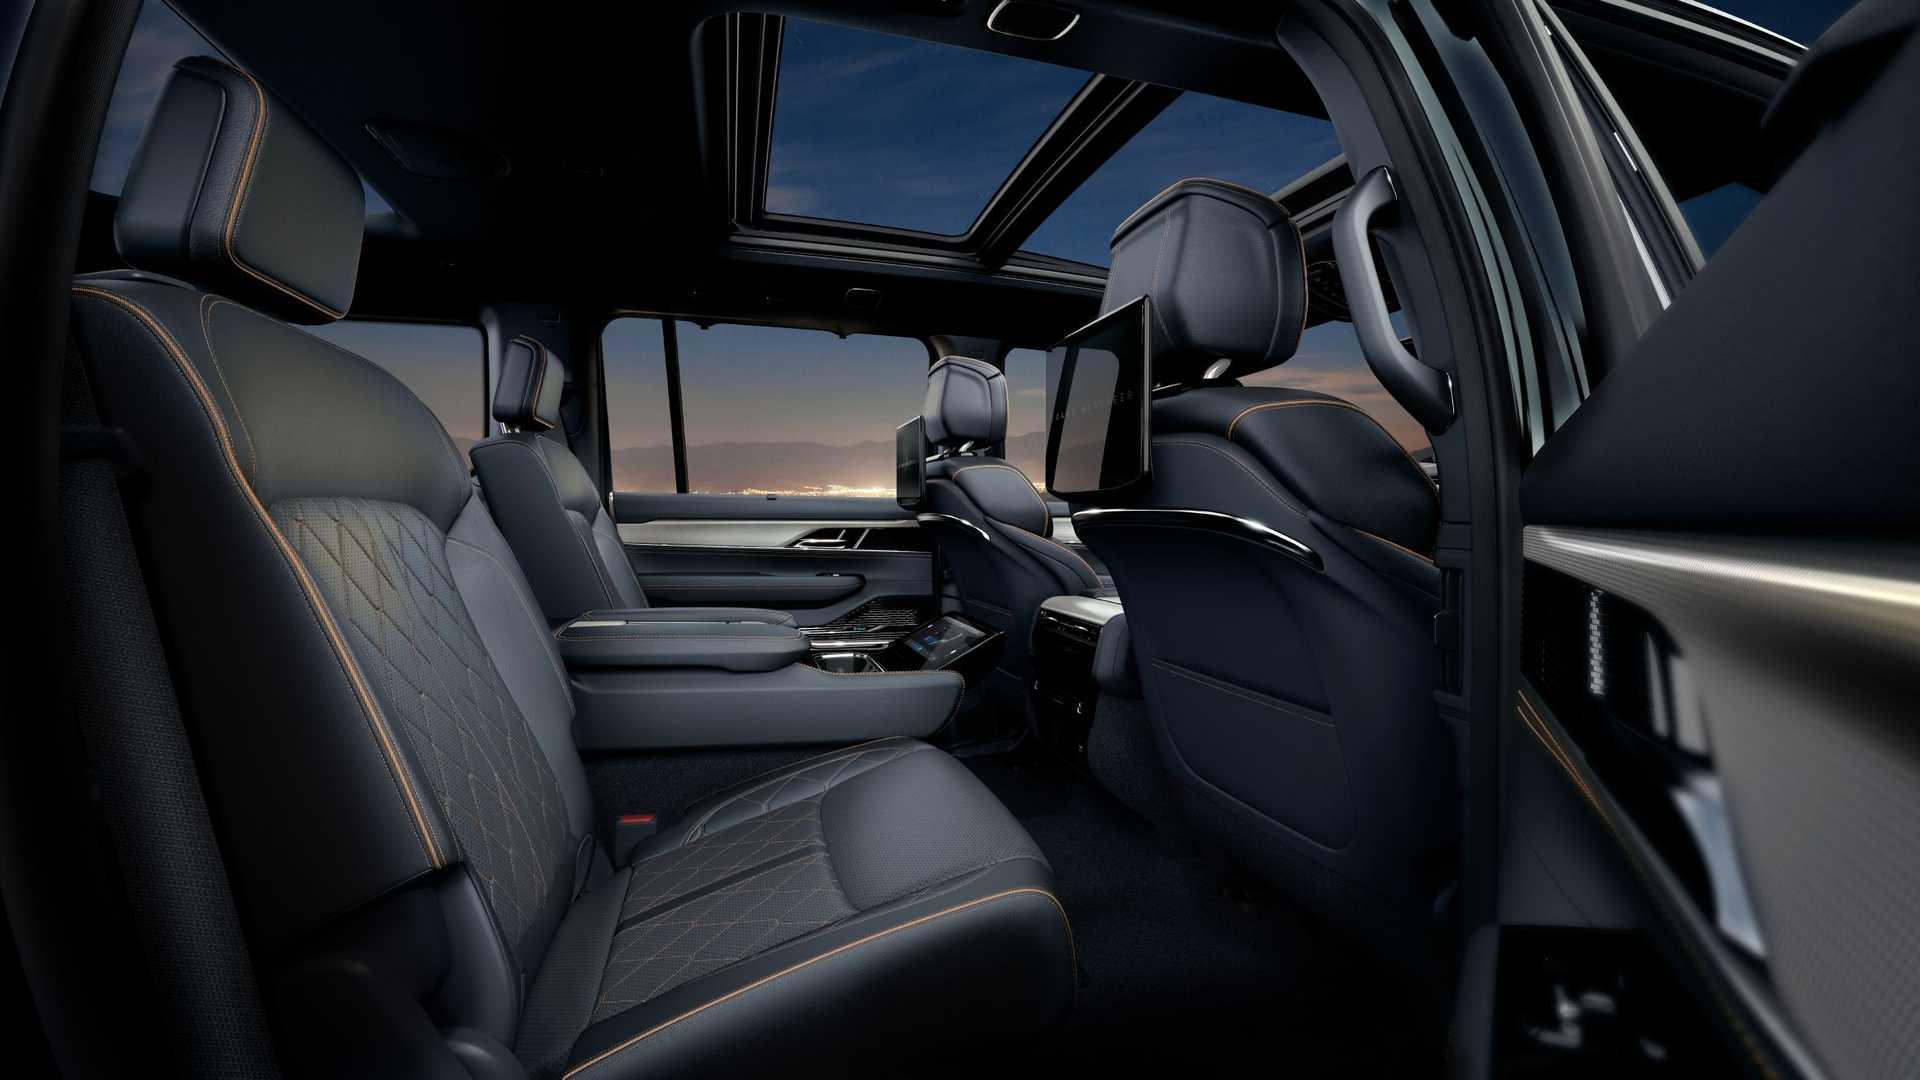 2022-jeep-grand-wagoneer-interior-second-row-1